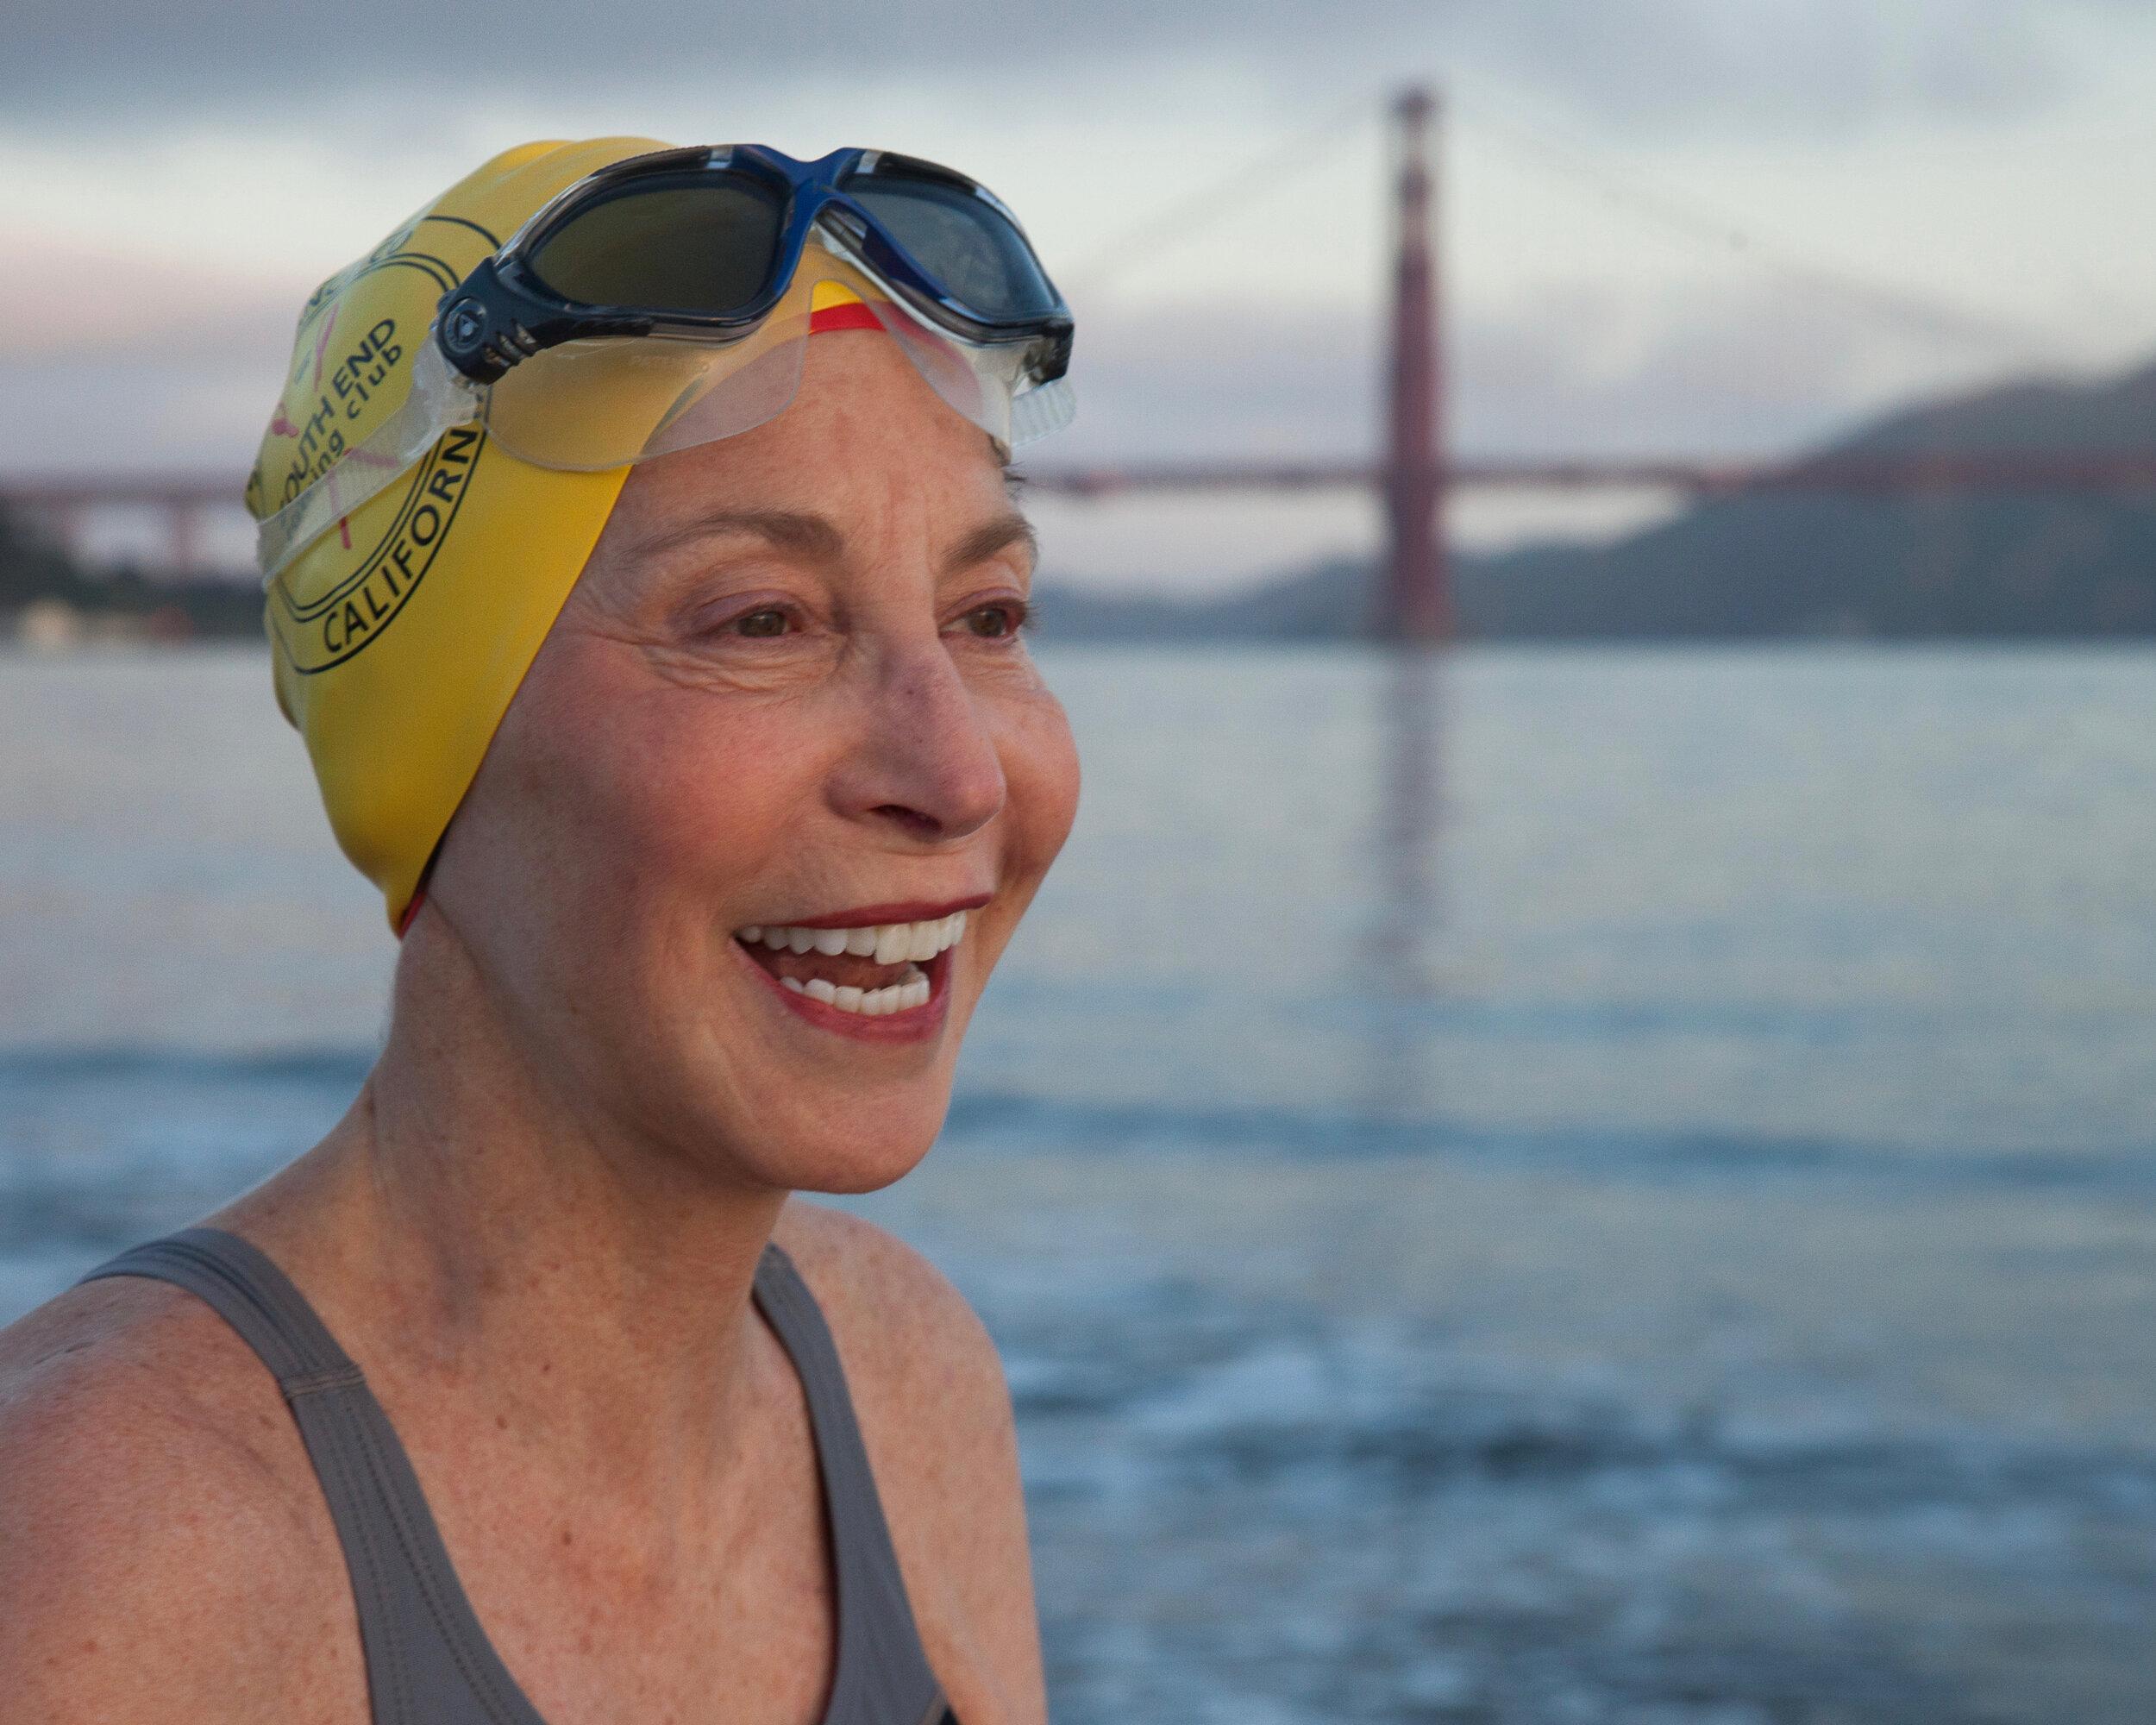 Roberta Guise, Principal Guise Marketing + PR San Francisco Bay swimmer